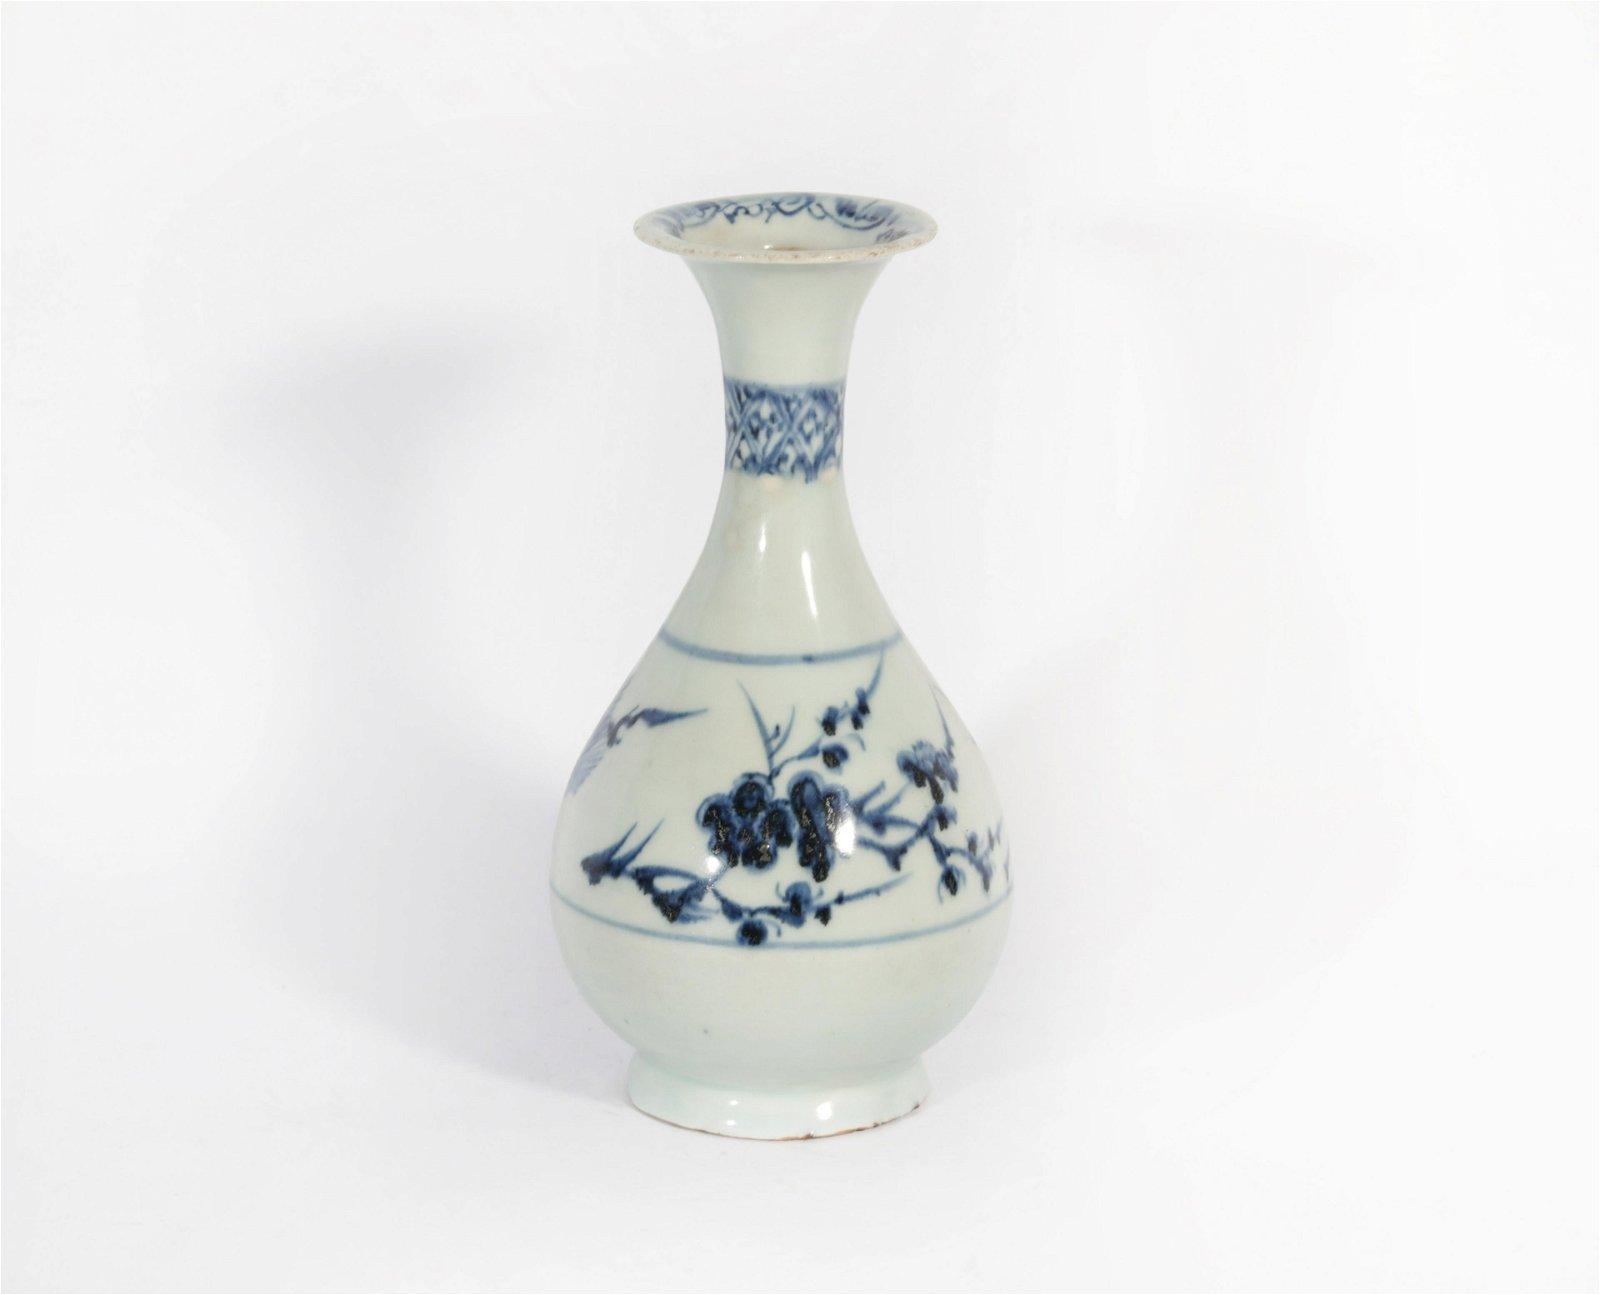 A Blue and White Yuhuchunping Yuan Dynasty